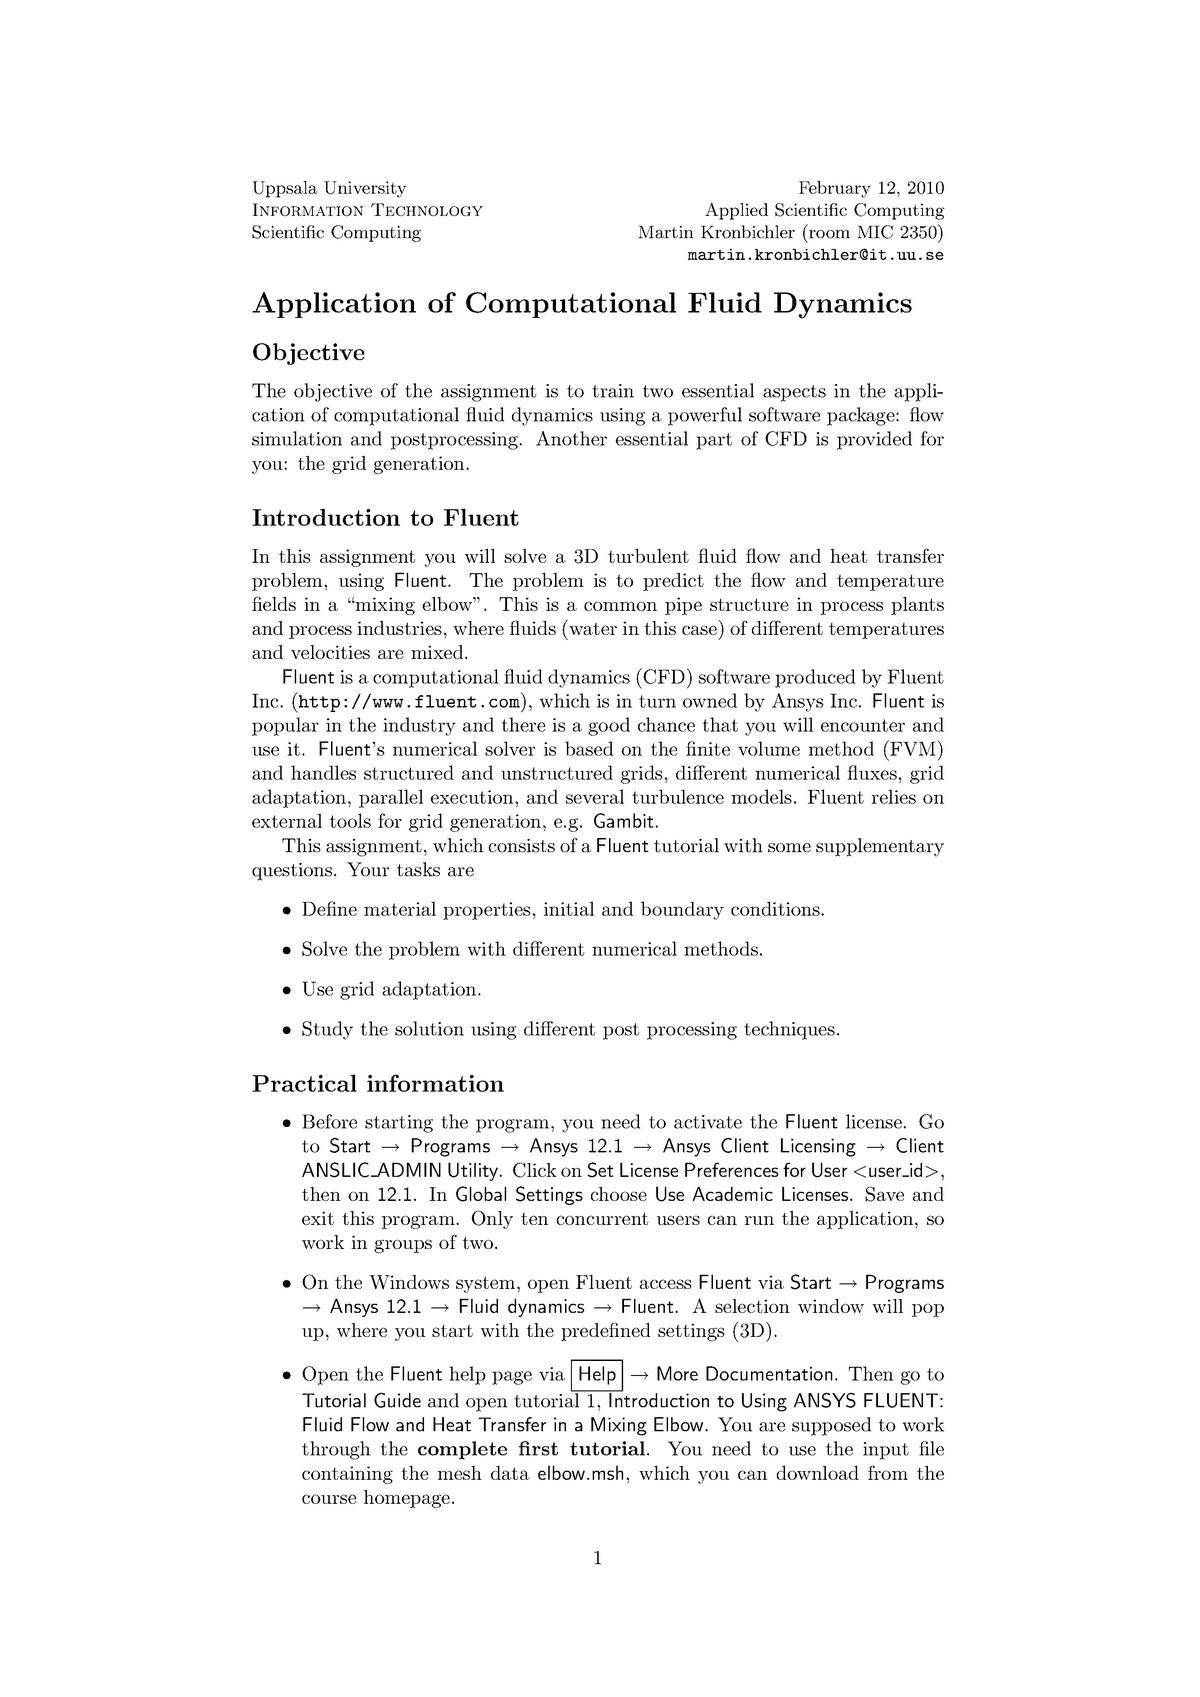 Mandatory Assignment Module 1-3 - Applied Scientific Computing 2010